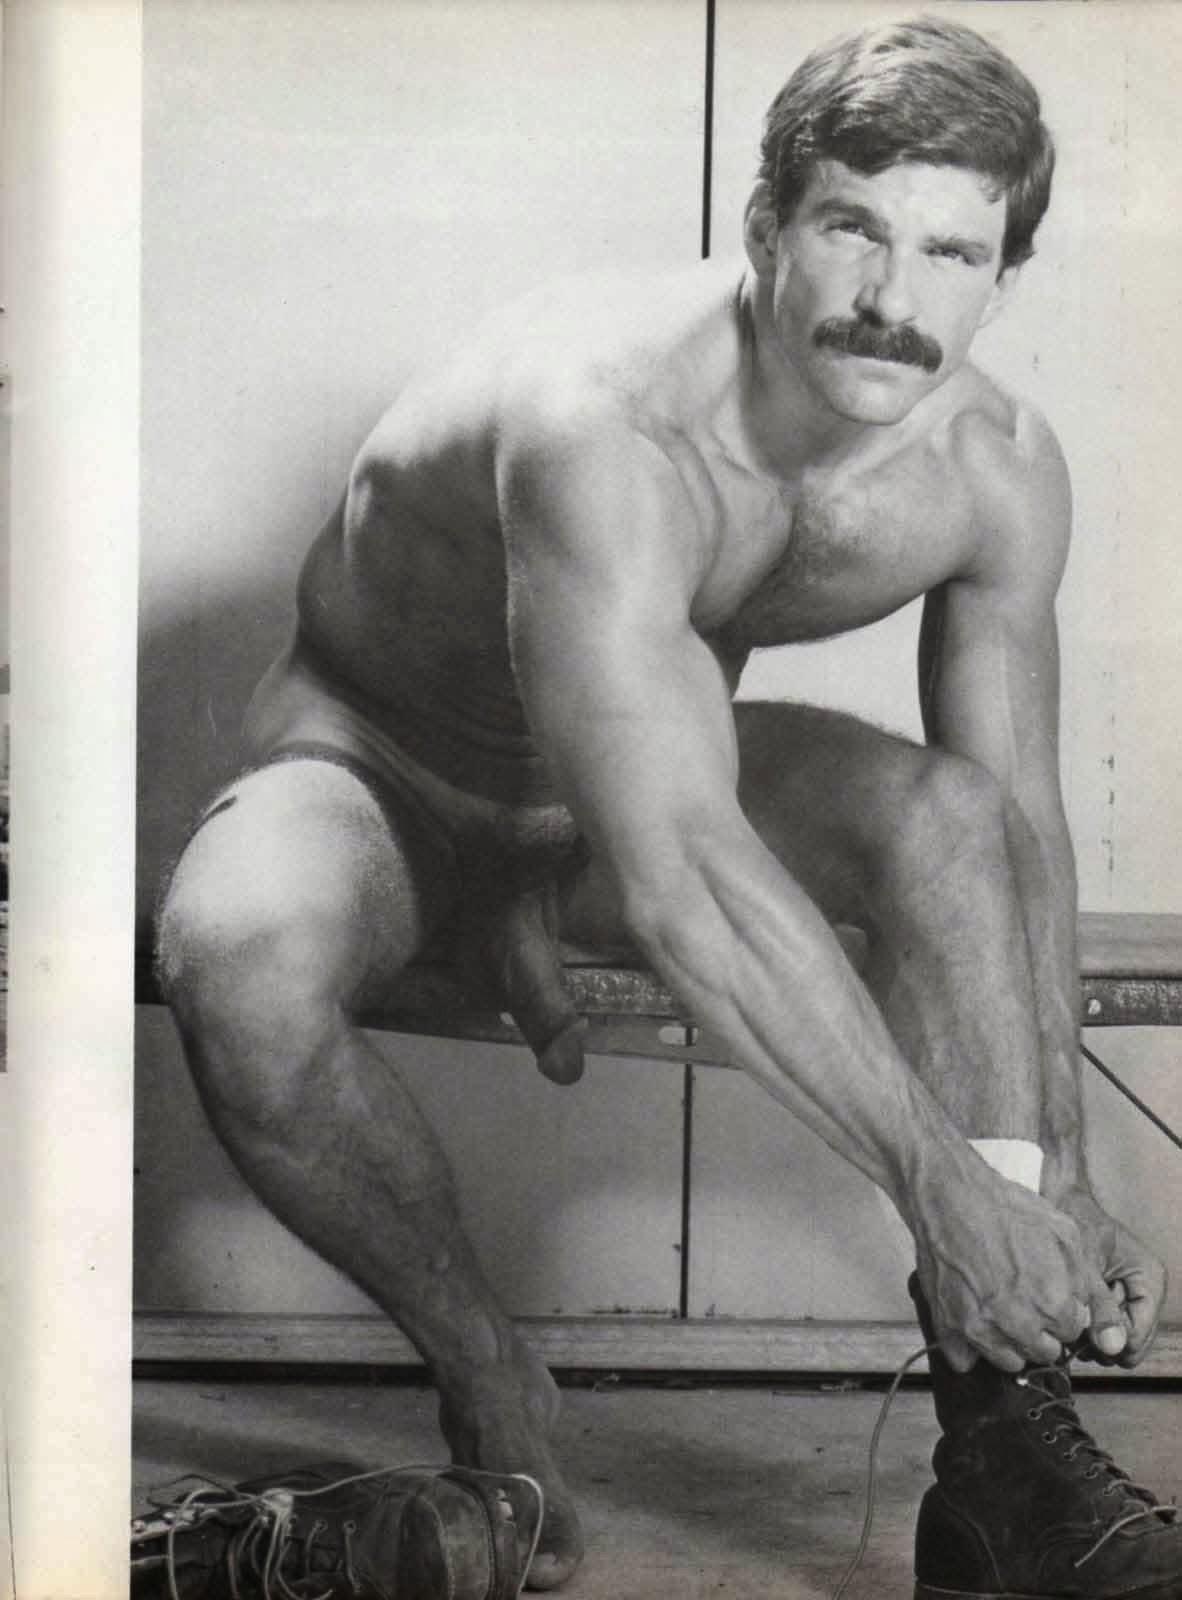 Rod Mitchell vintage gay hot daddy dude men porn